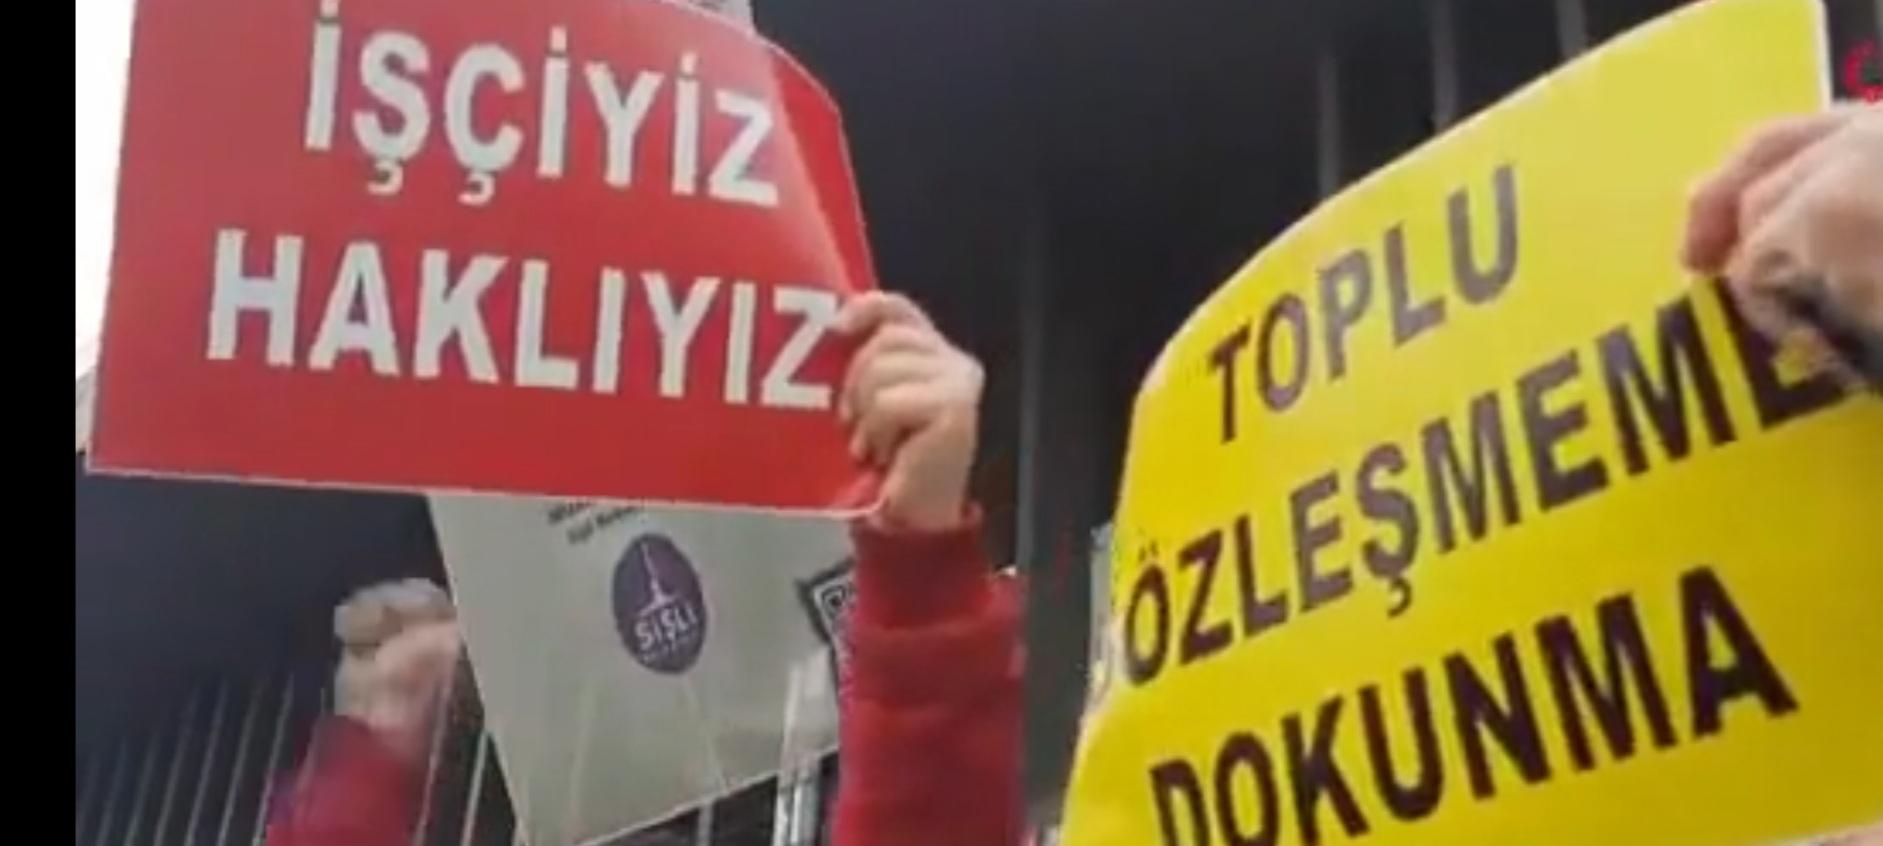 sisli-belediyesi-iscileri-muammer-keskin-i-protesto-ettiler2.jpg